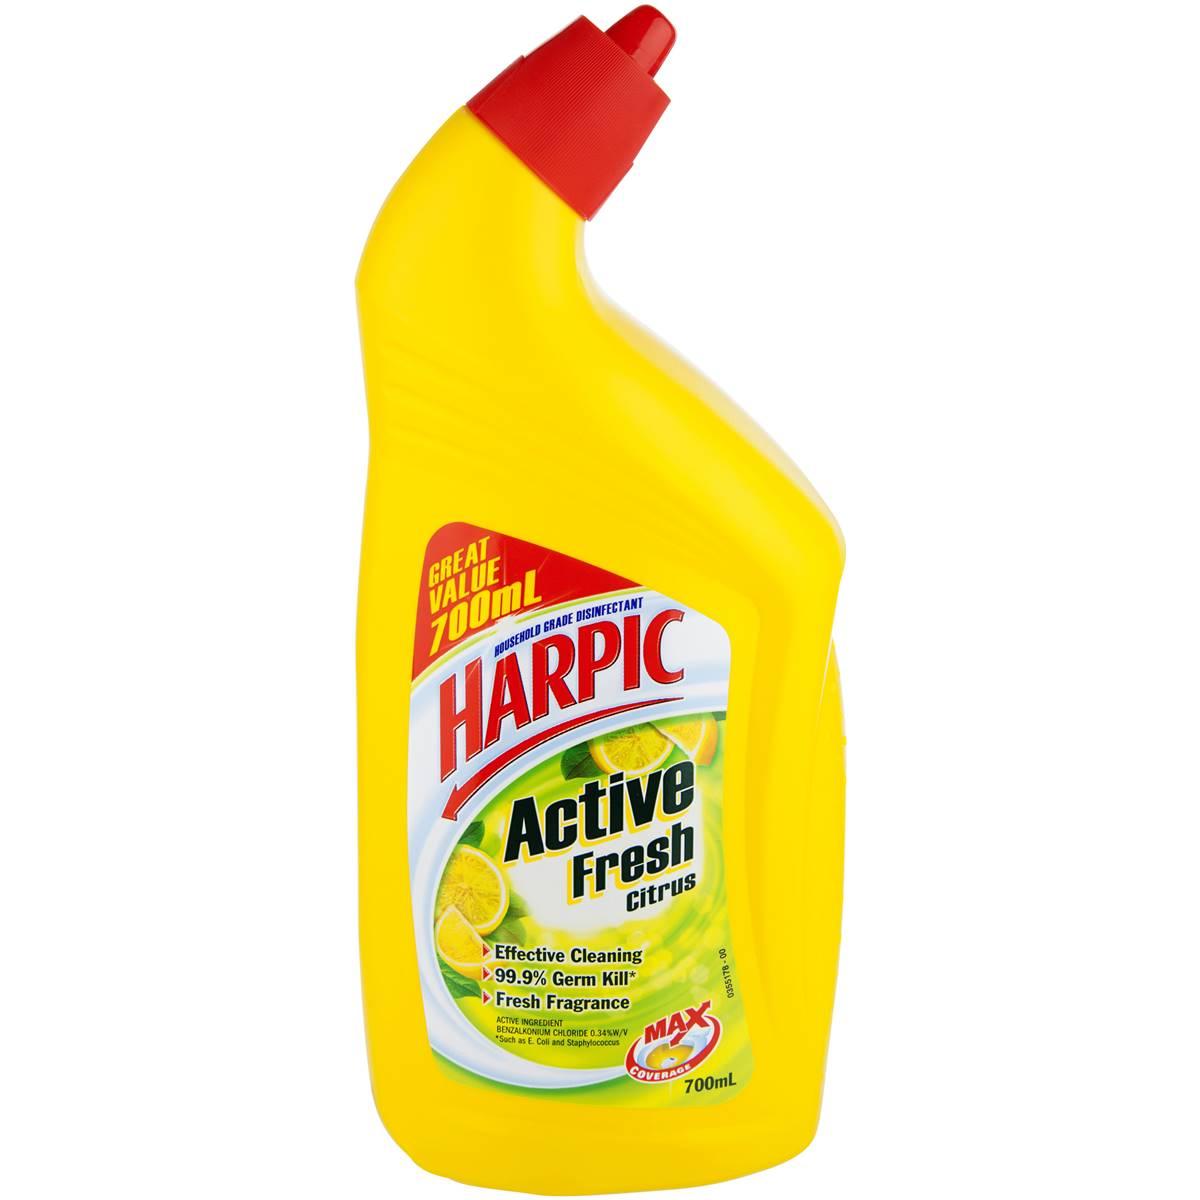 harpic active toilet cleaner citrus